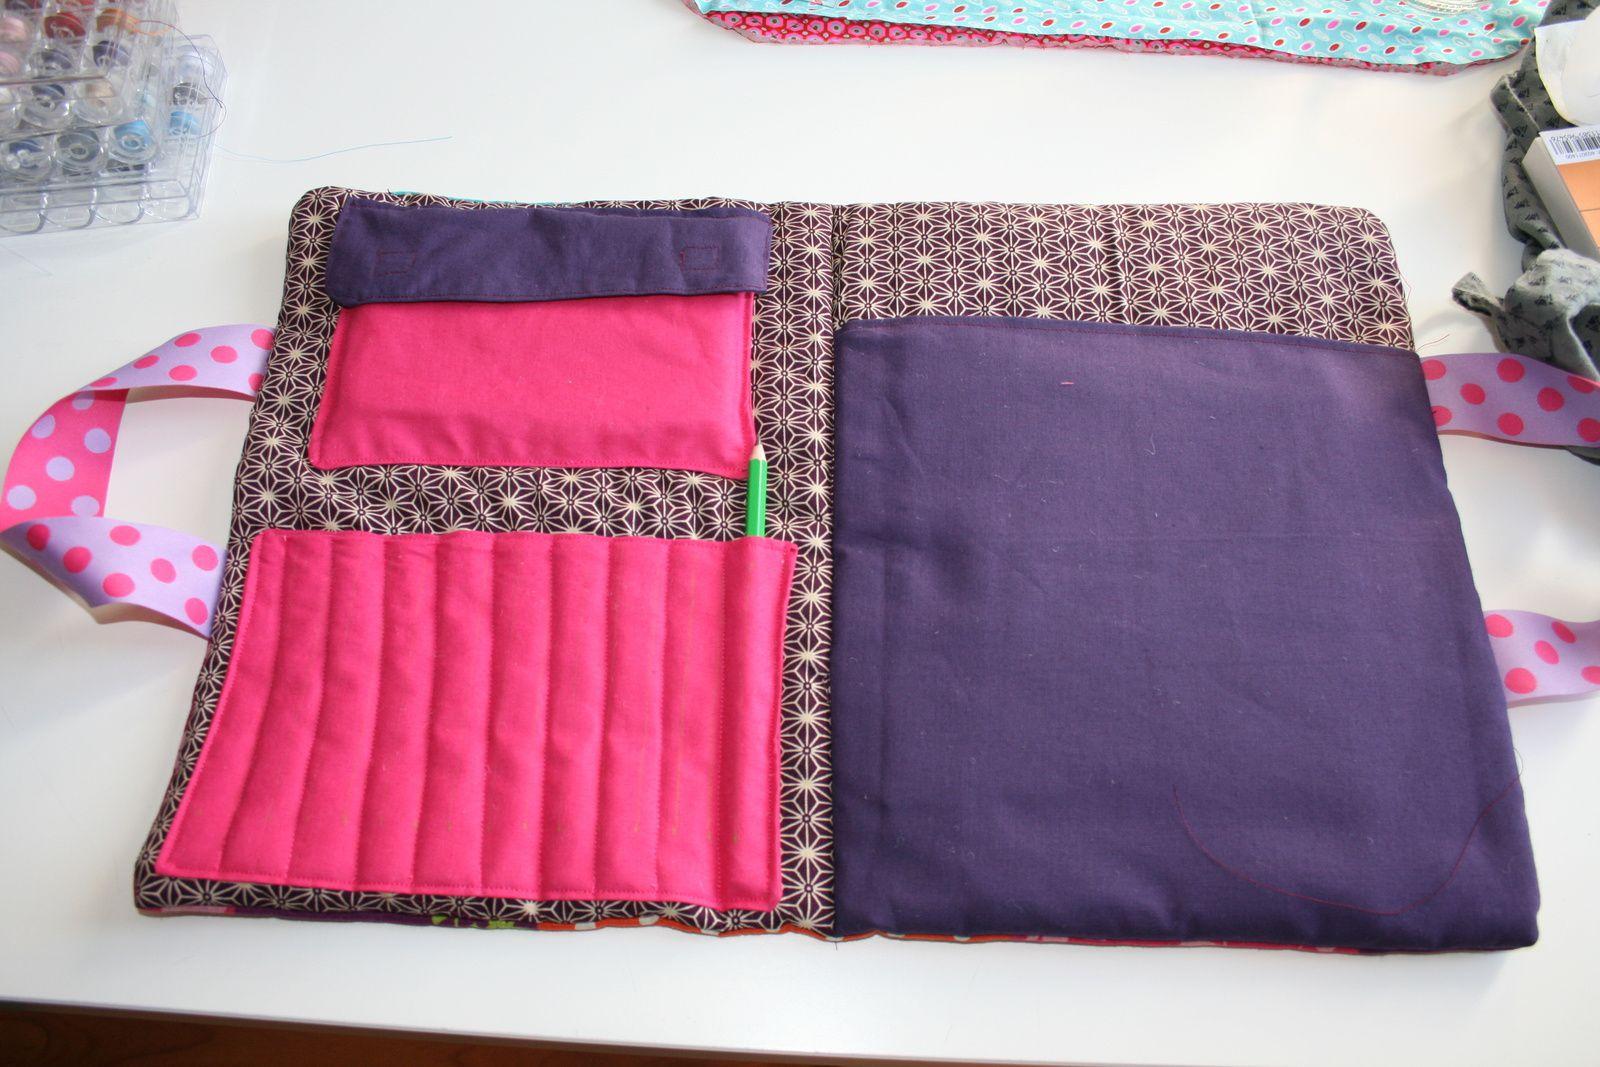 La couture mamanlit for Malette de couture complete